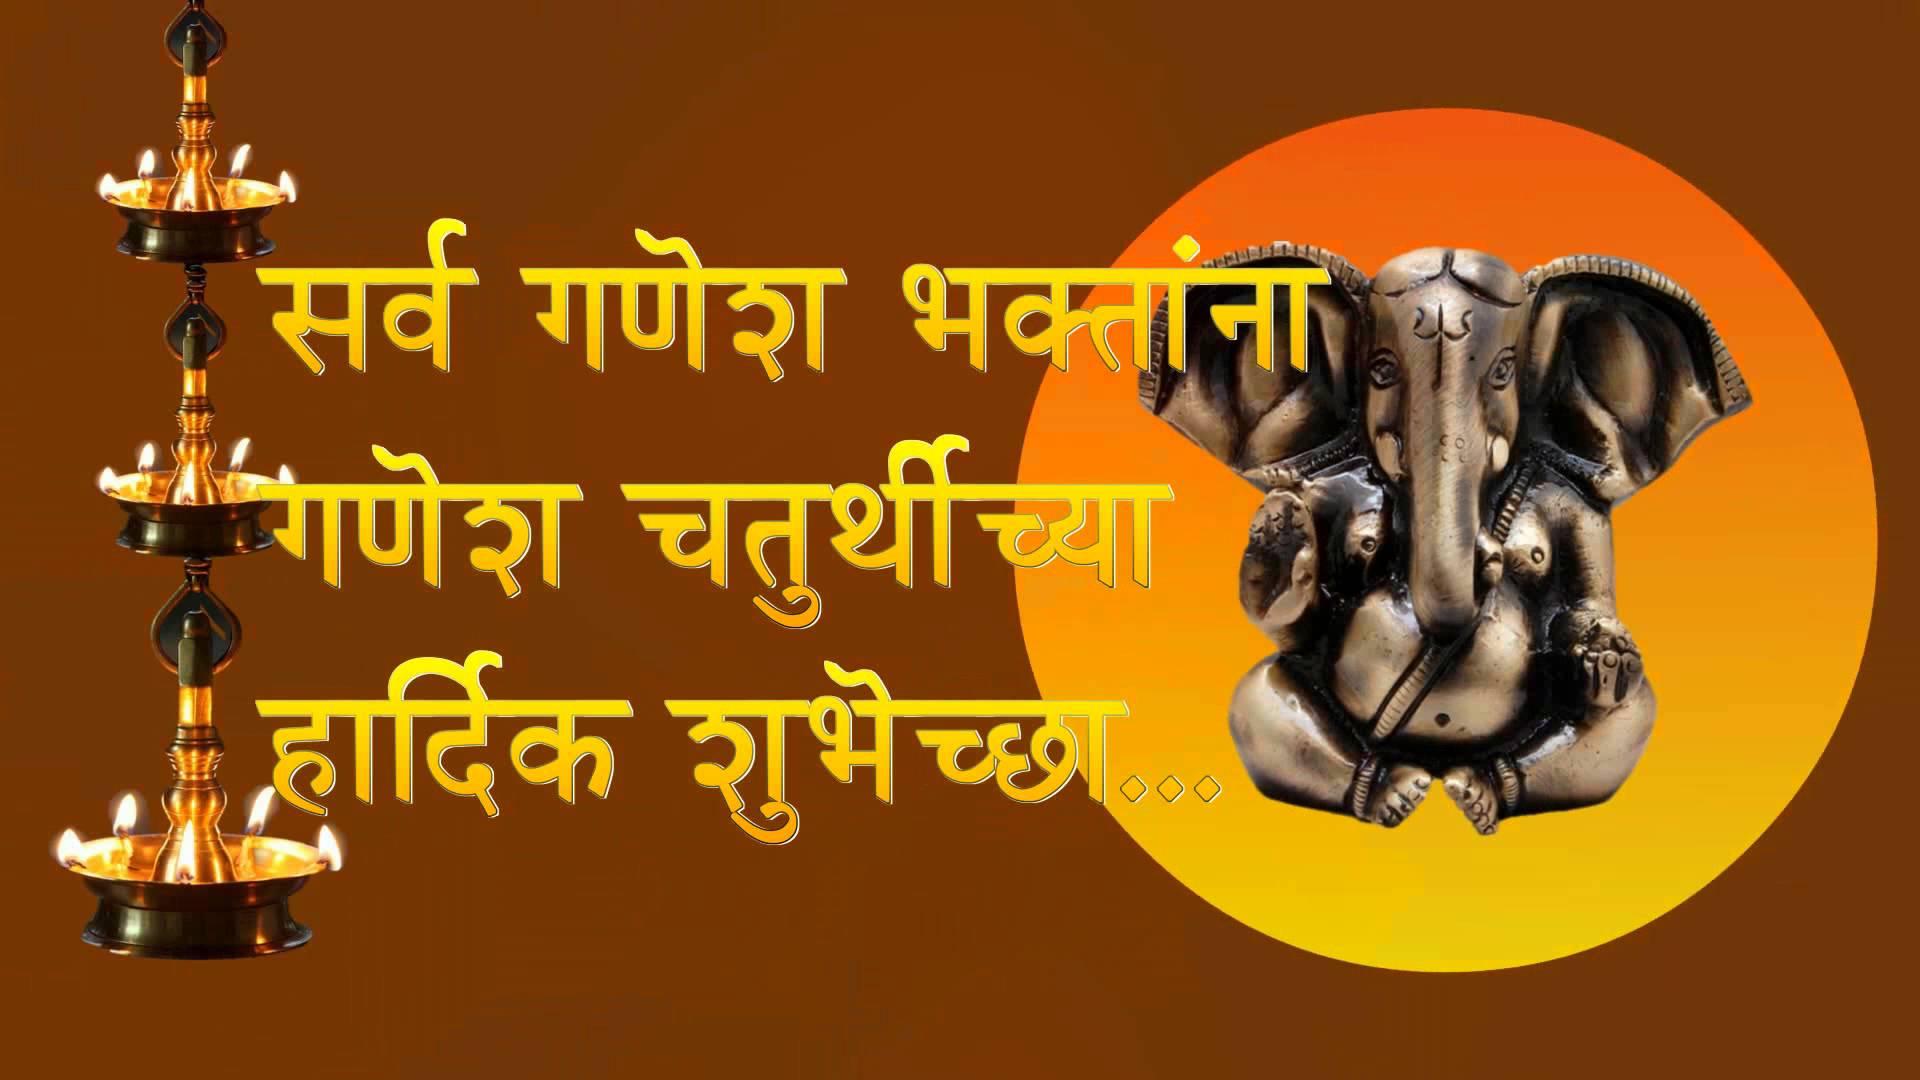 ganesh chaturthi 2016 wishes in marathi